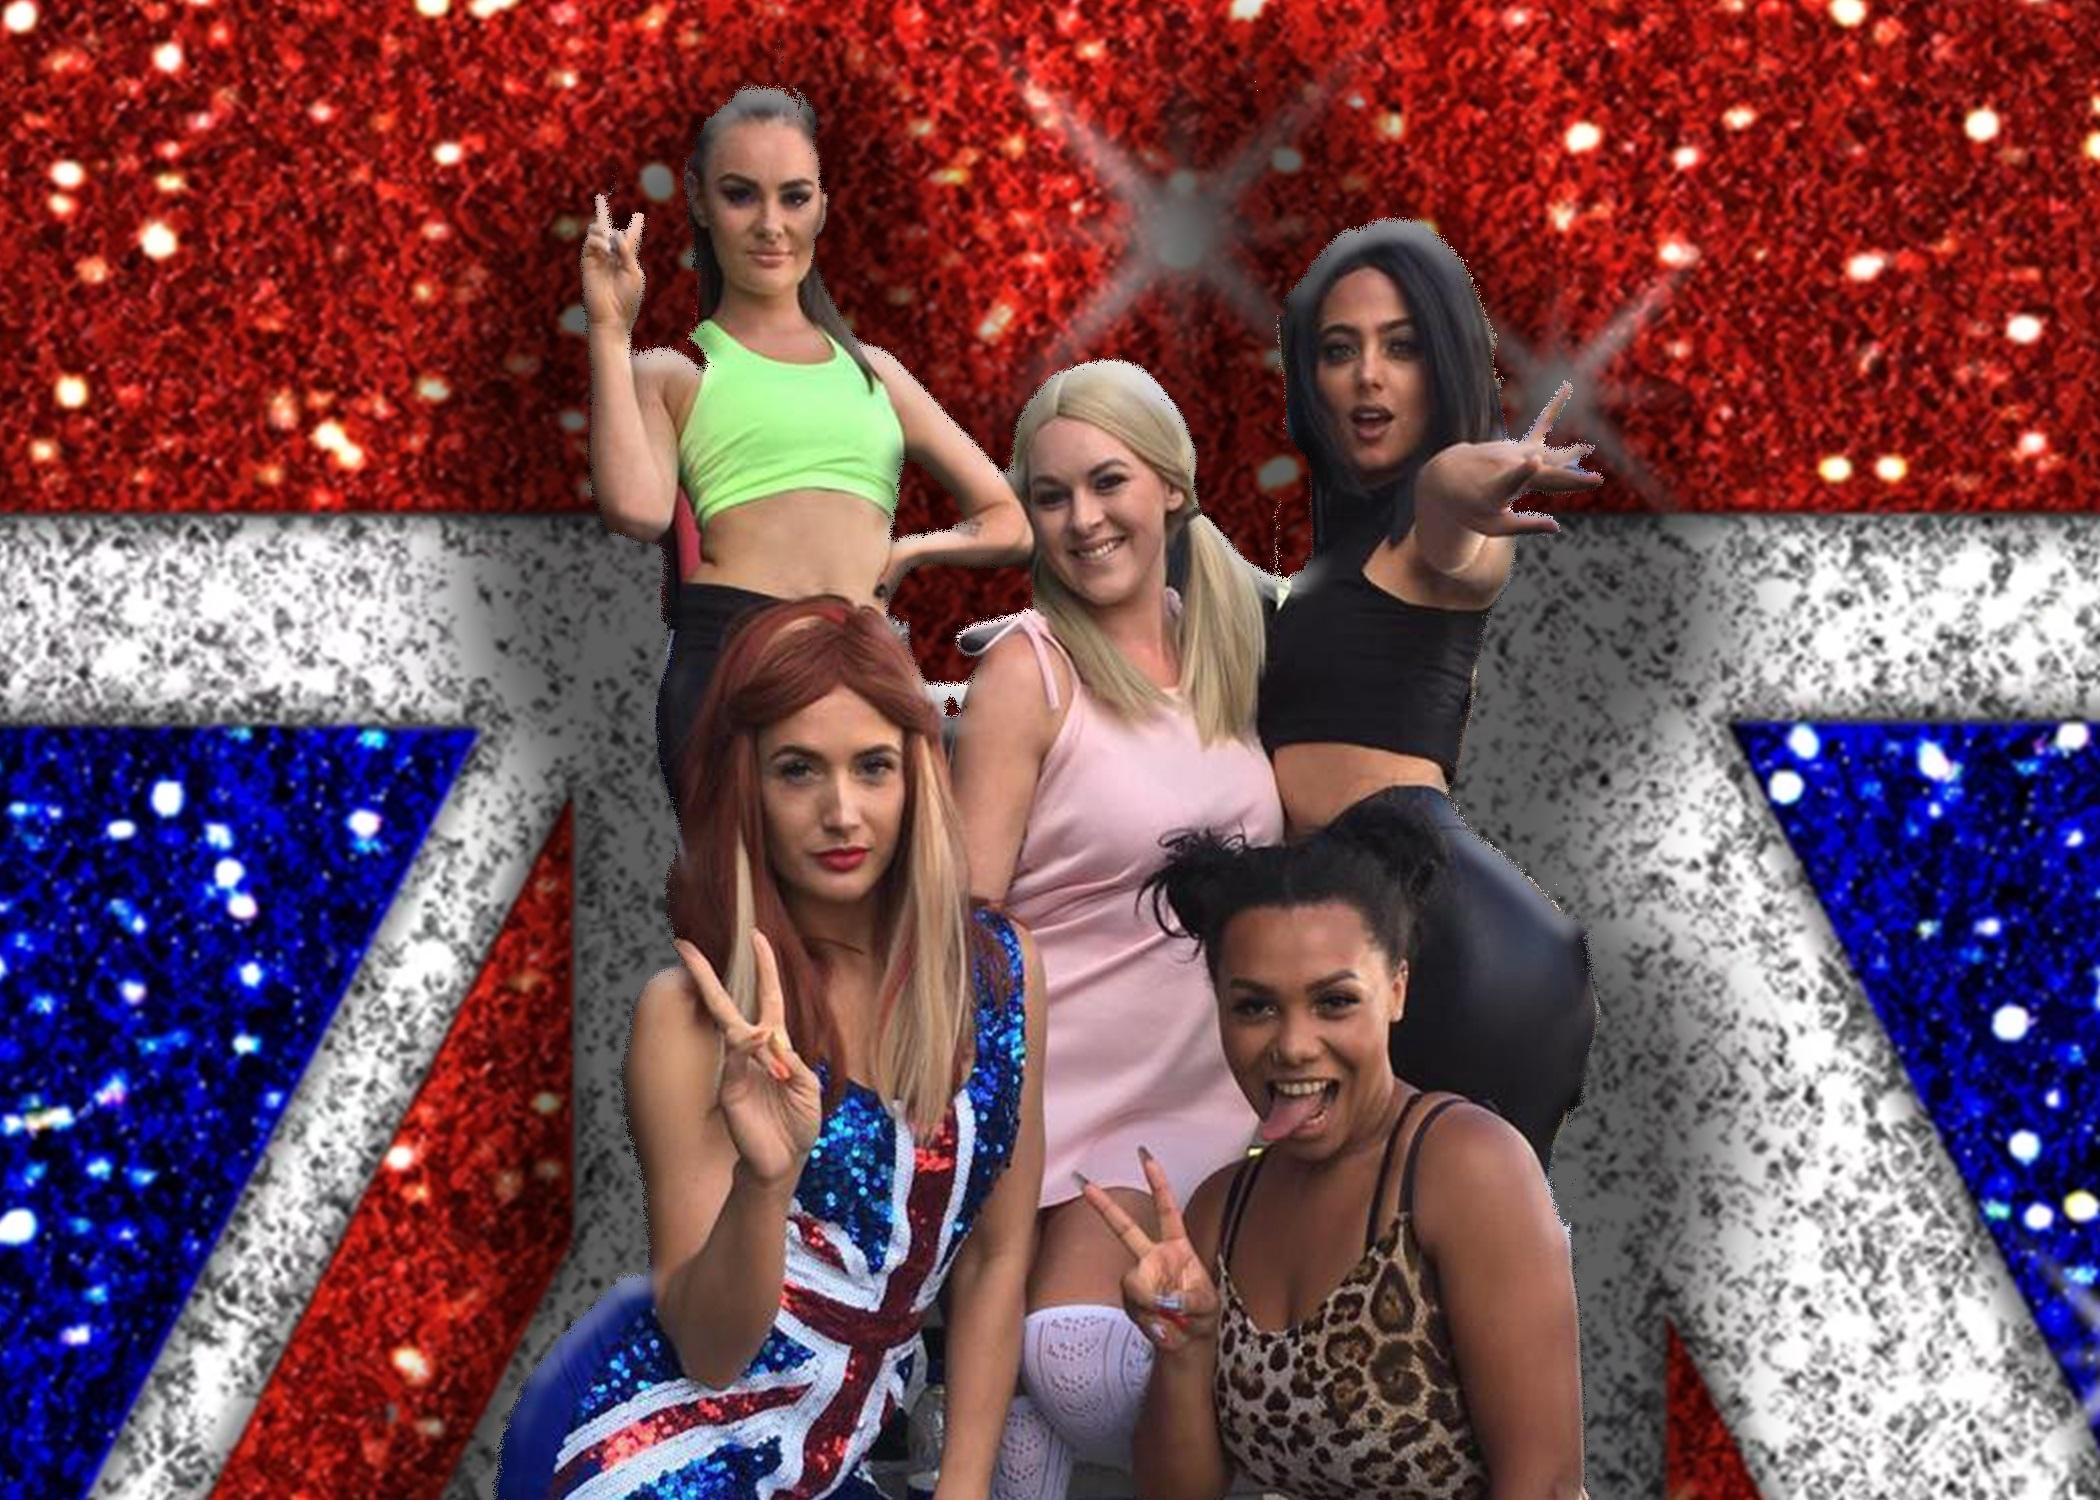 Spice Girls Tribute Band - Spice Girlz